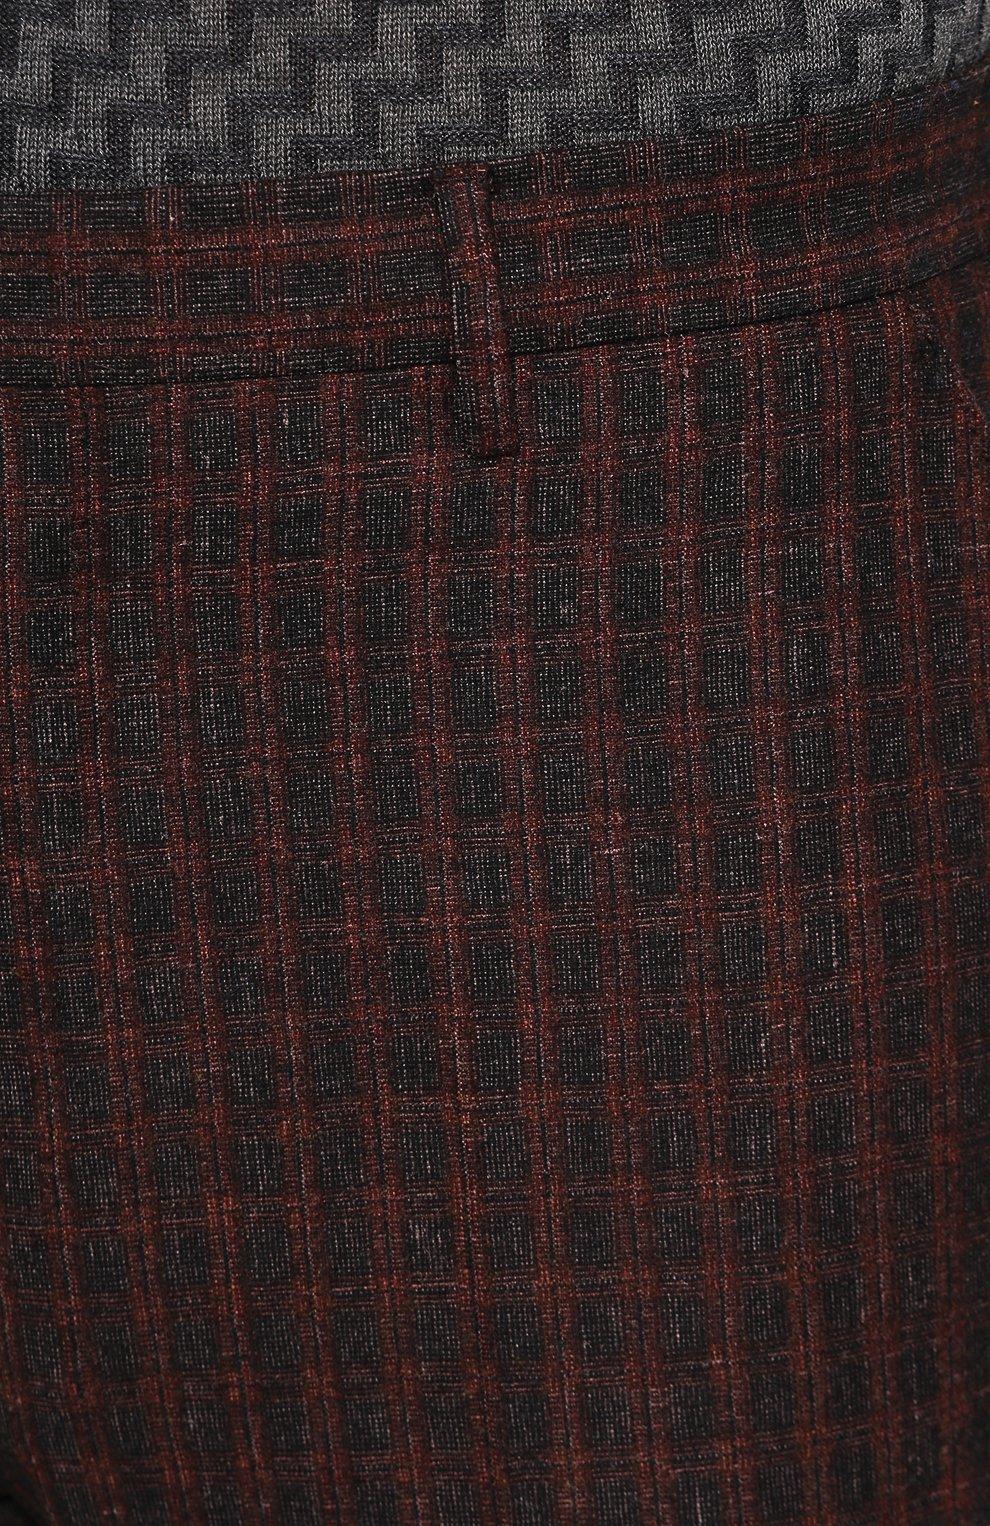 Мужские брюки из смеси шерсти и шелка ANDREA CAMPAGNA коричневого цвета, арт. VULCAN0/VB1293 | Фото 5